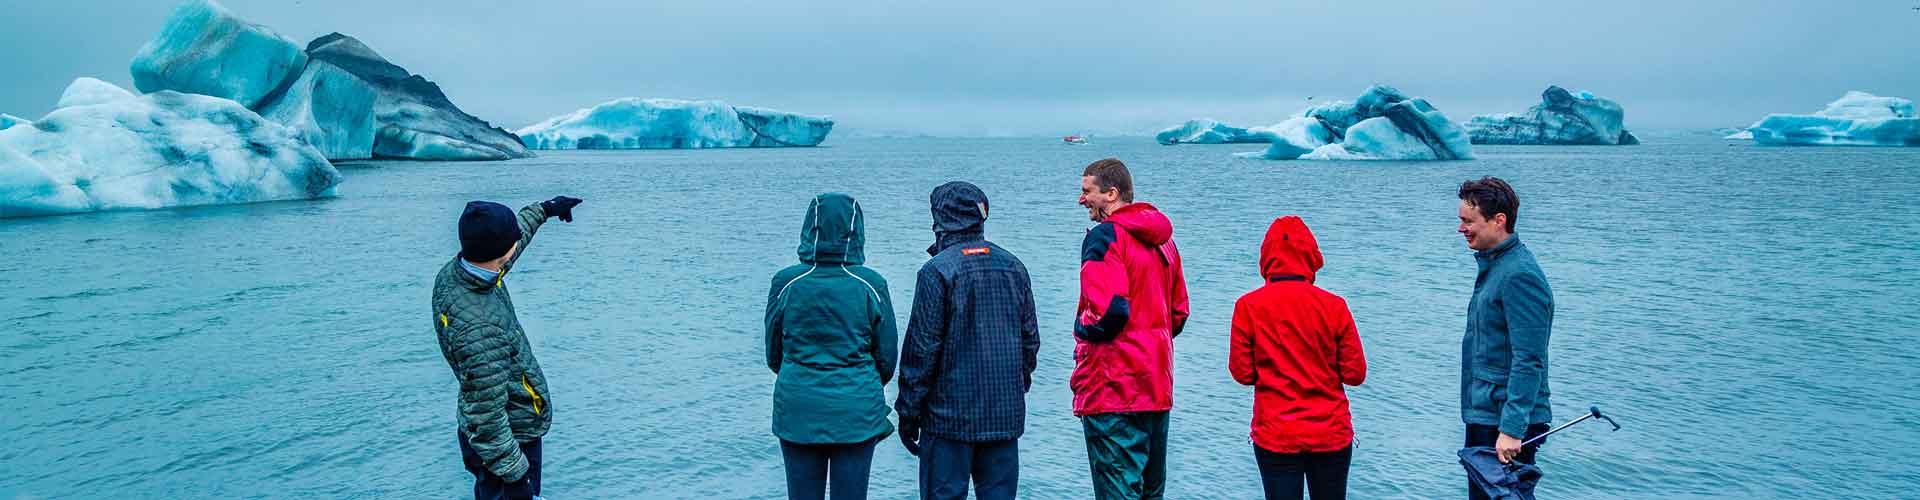 Iceland Express I Intrepid Travel